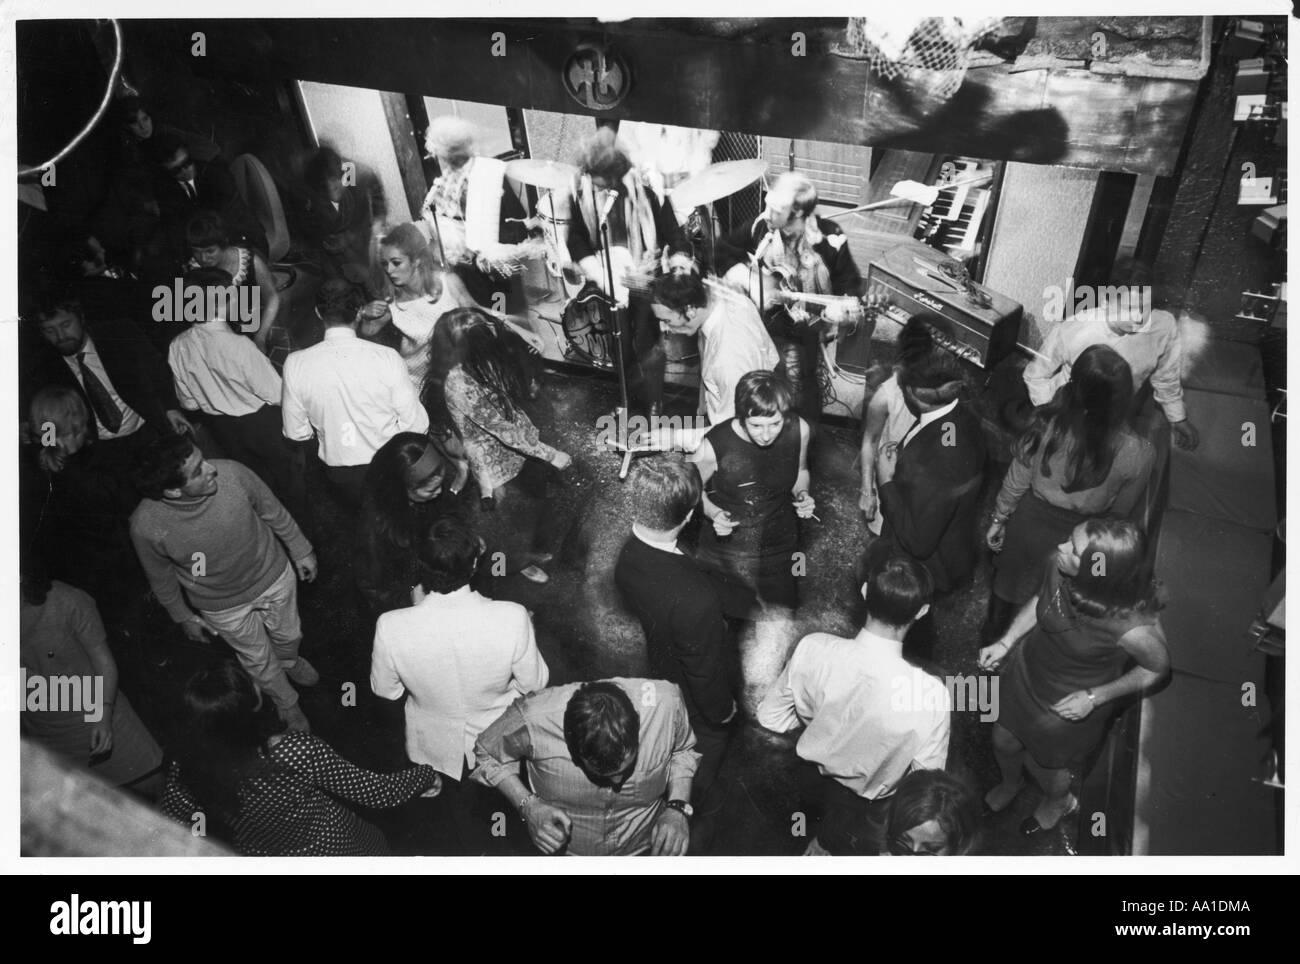 Swinging Nightclub 1960s - Stock Image